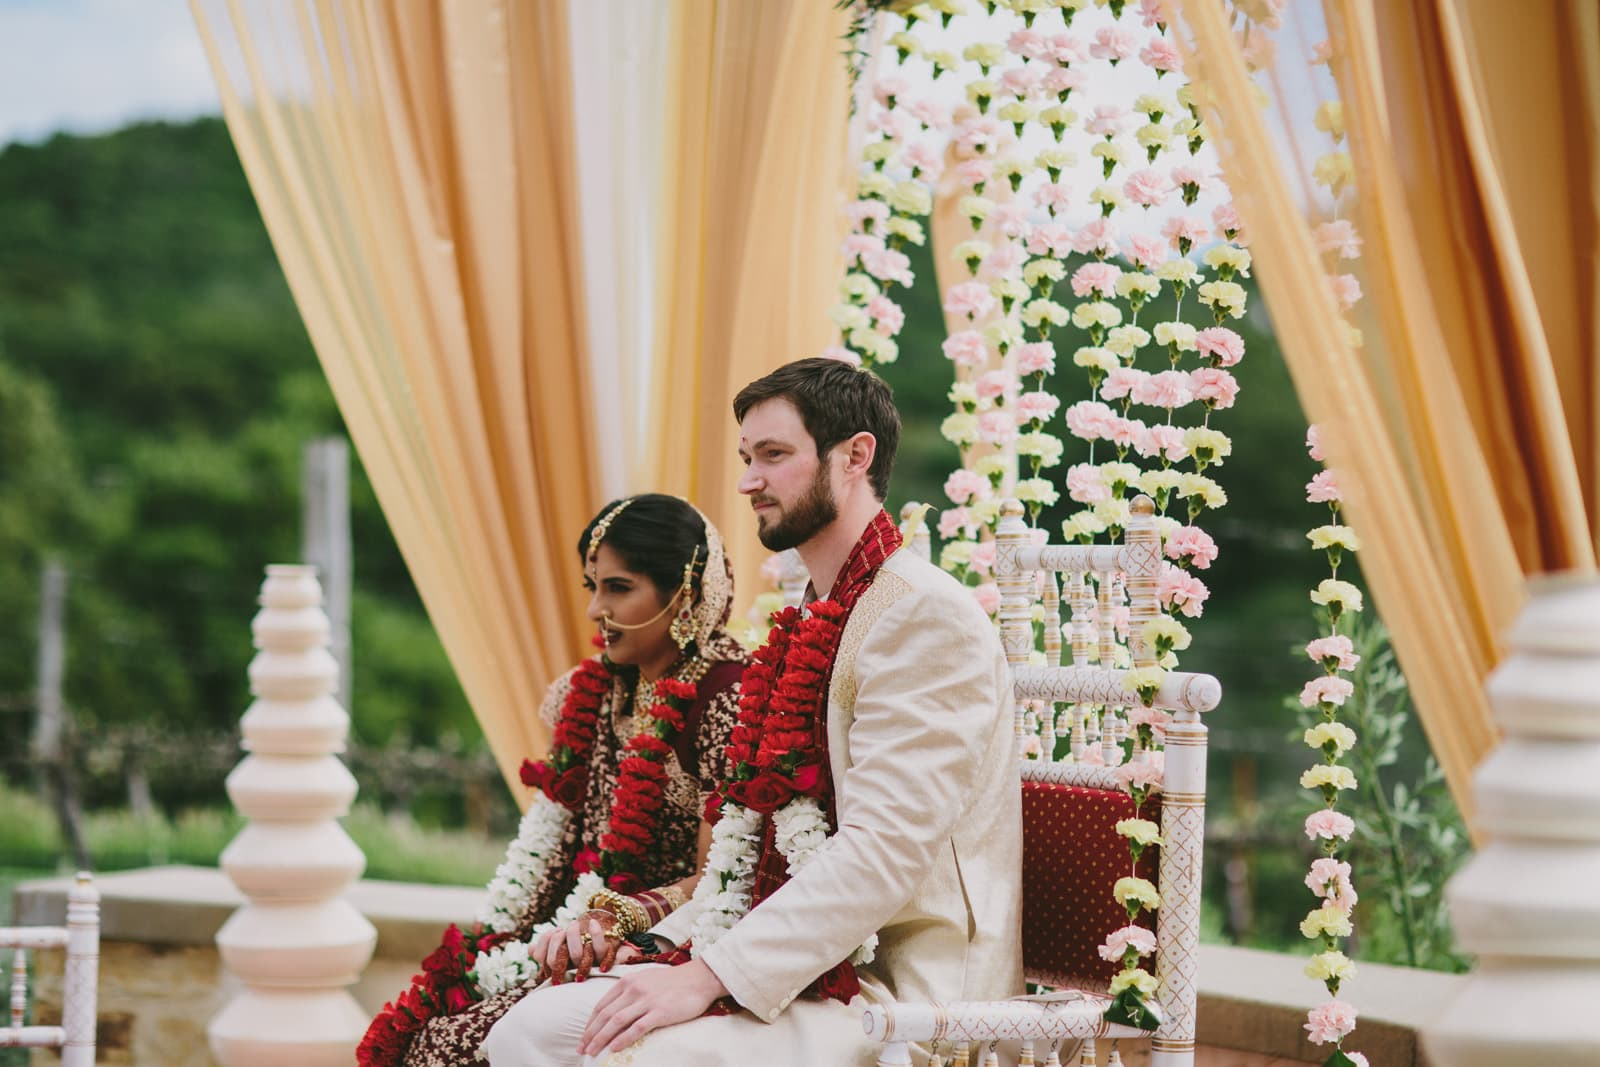 Holman_Ranch_Wedding_Indian_Wedding_042